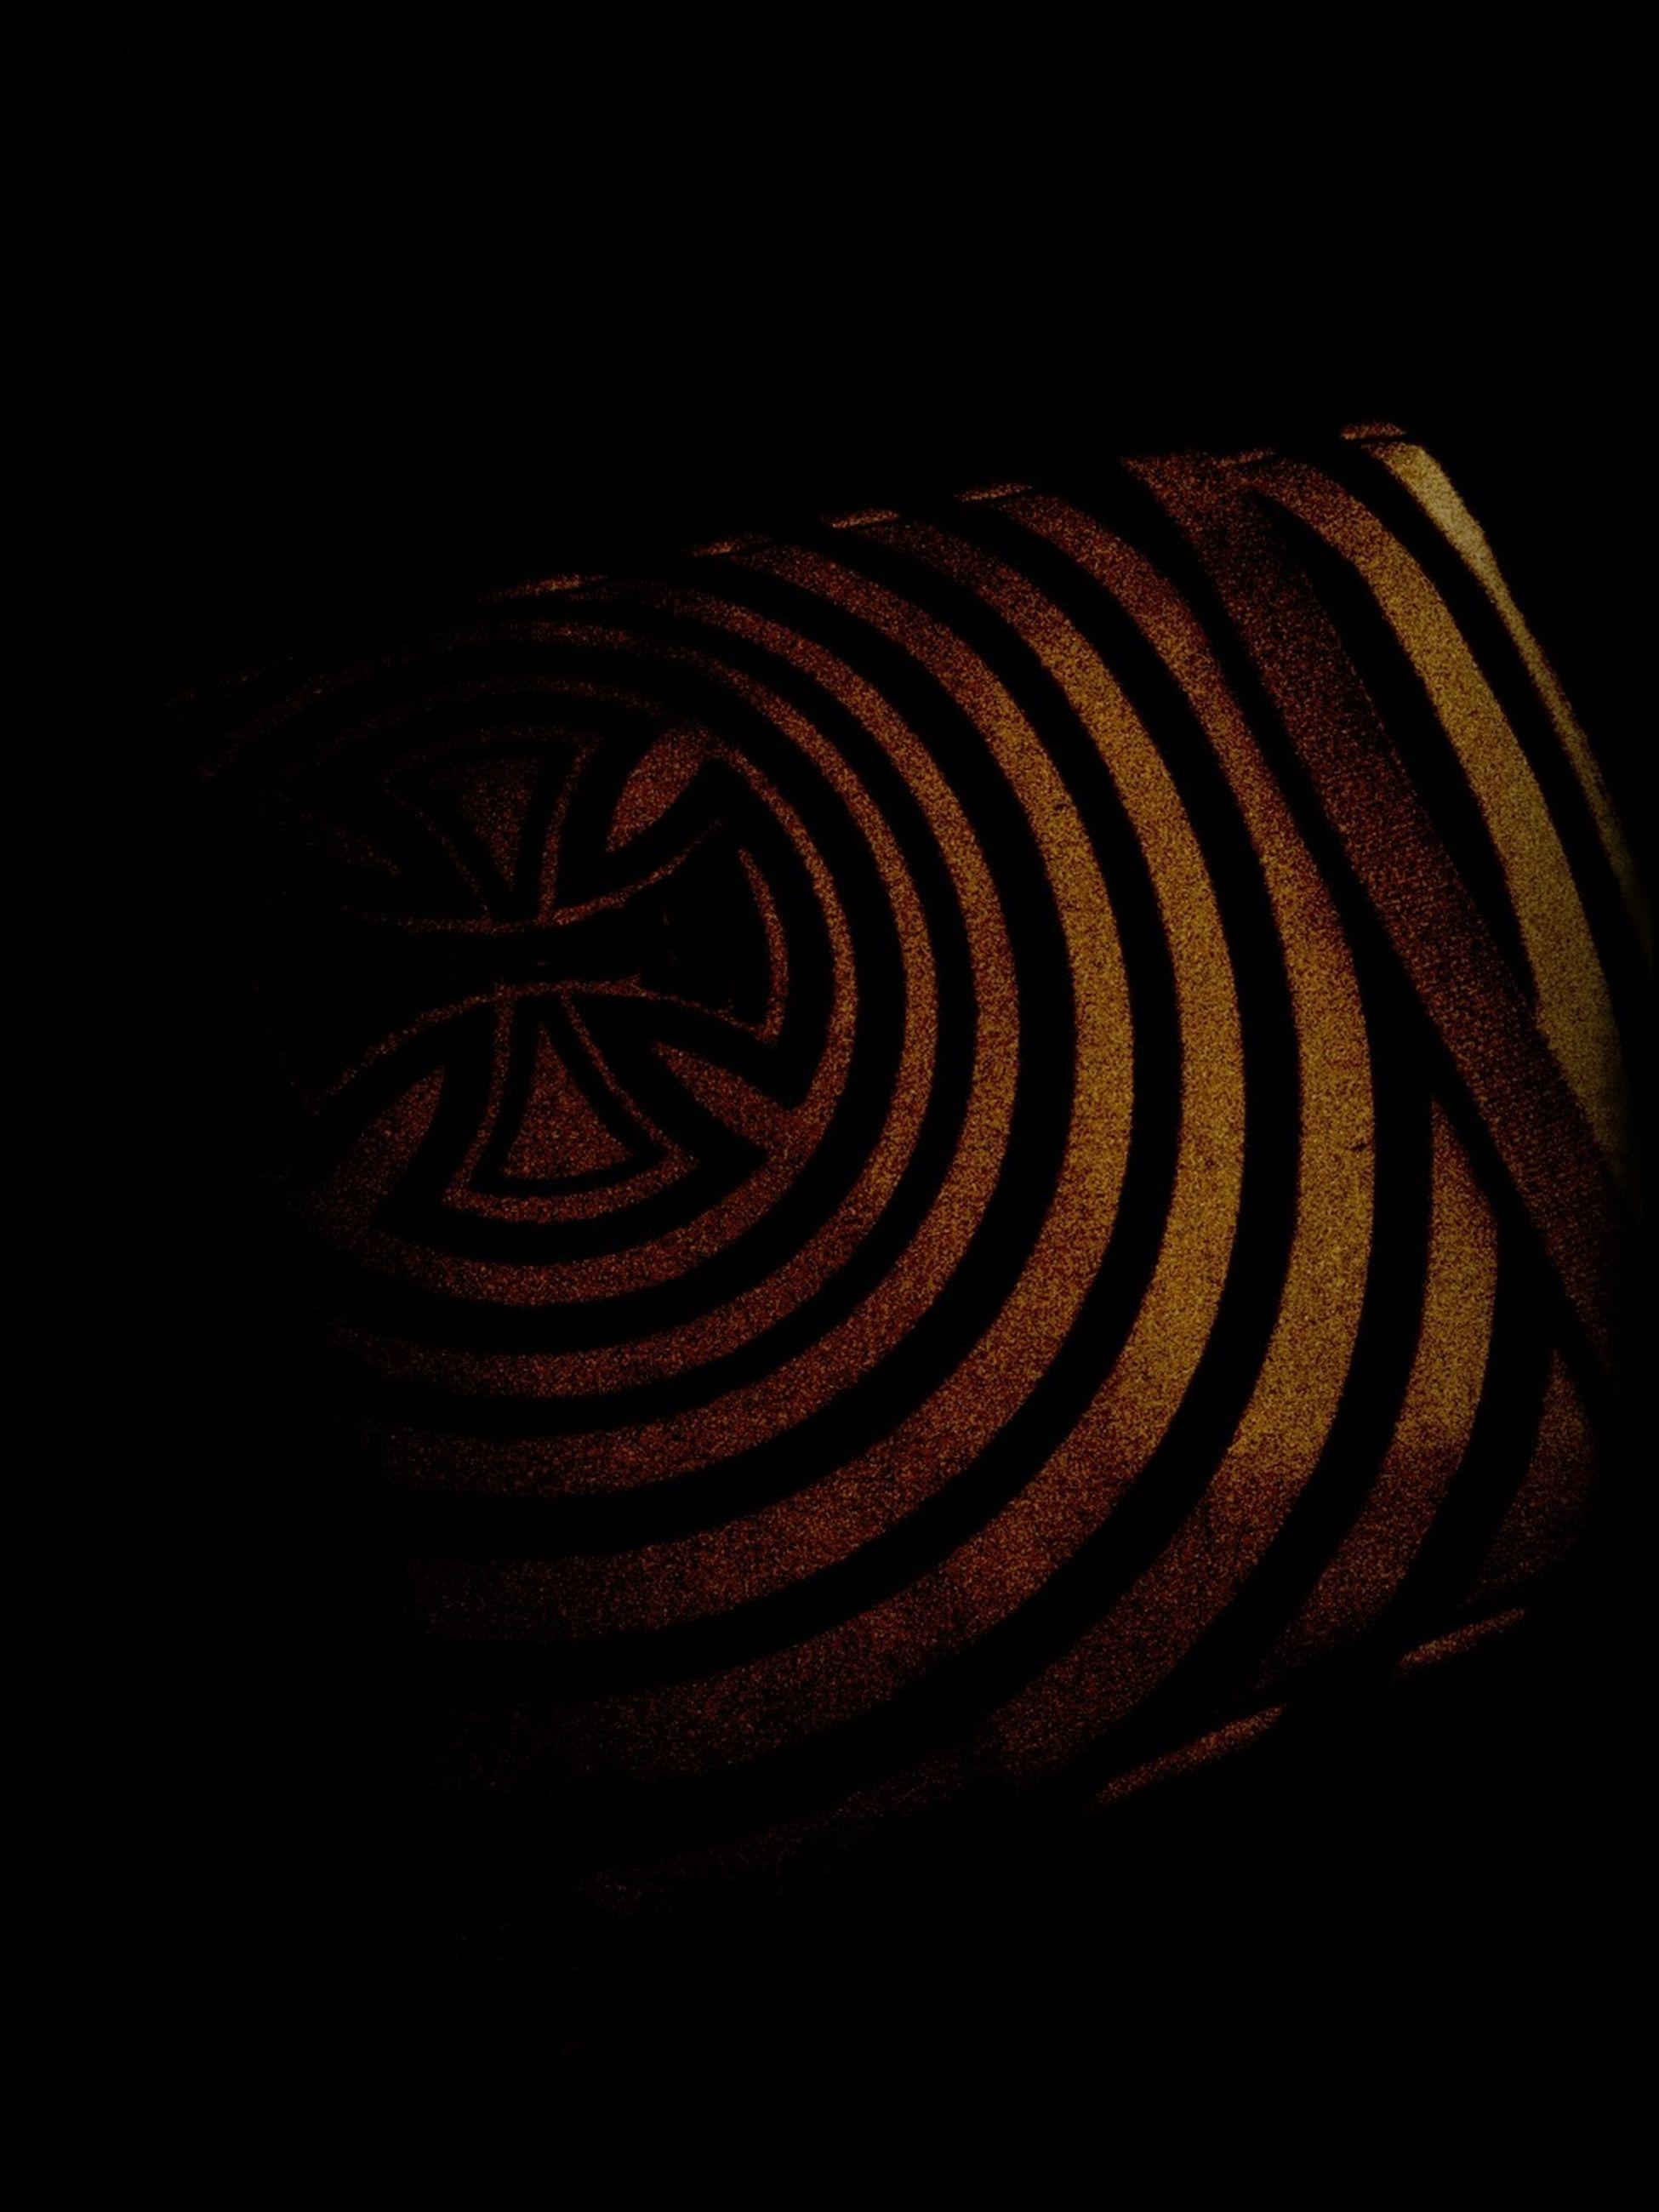 pattern, night, illuminated, black background, indoors, studio shot, design, abstract, dark, art and craft, close-up, creativity, art, no people, copy space, light - natural phenomenon, shape, backgrounds, decoration, full frame